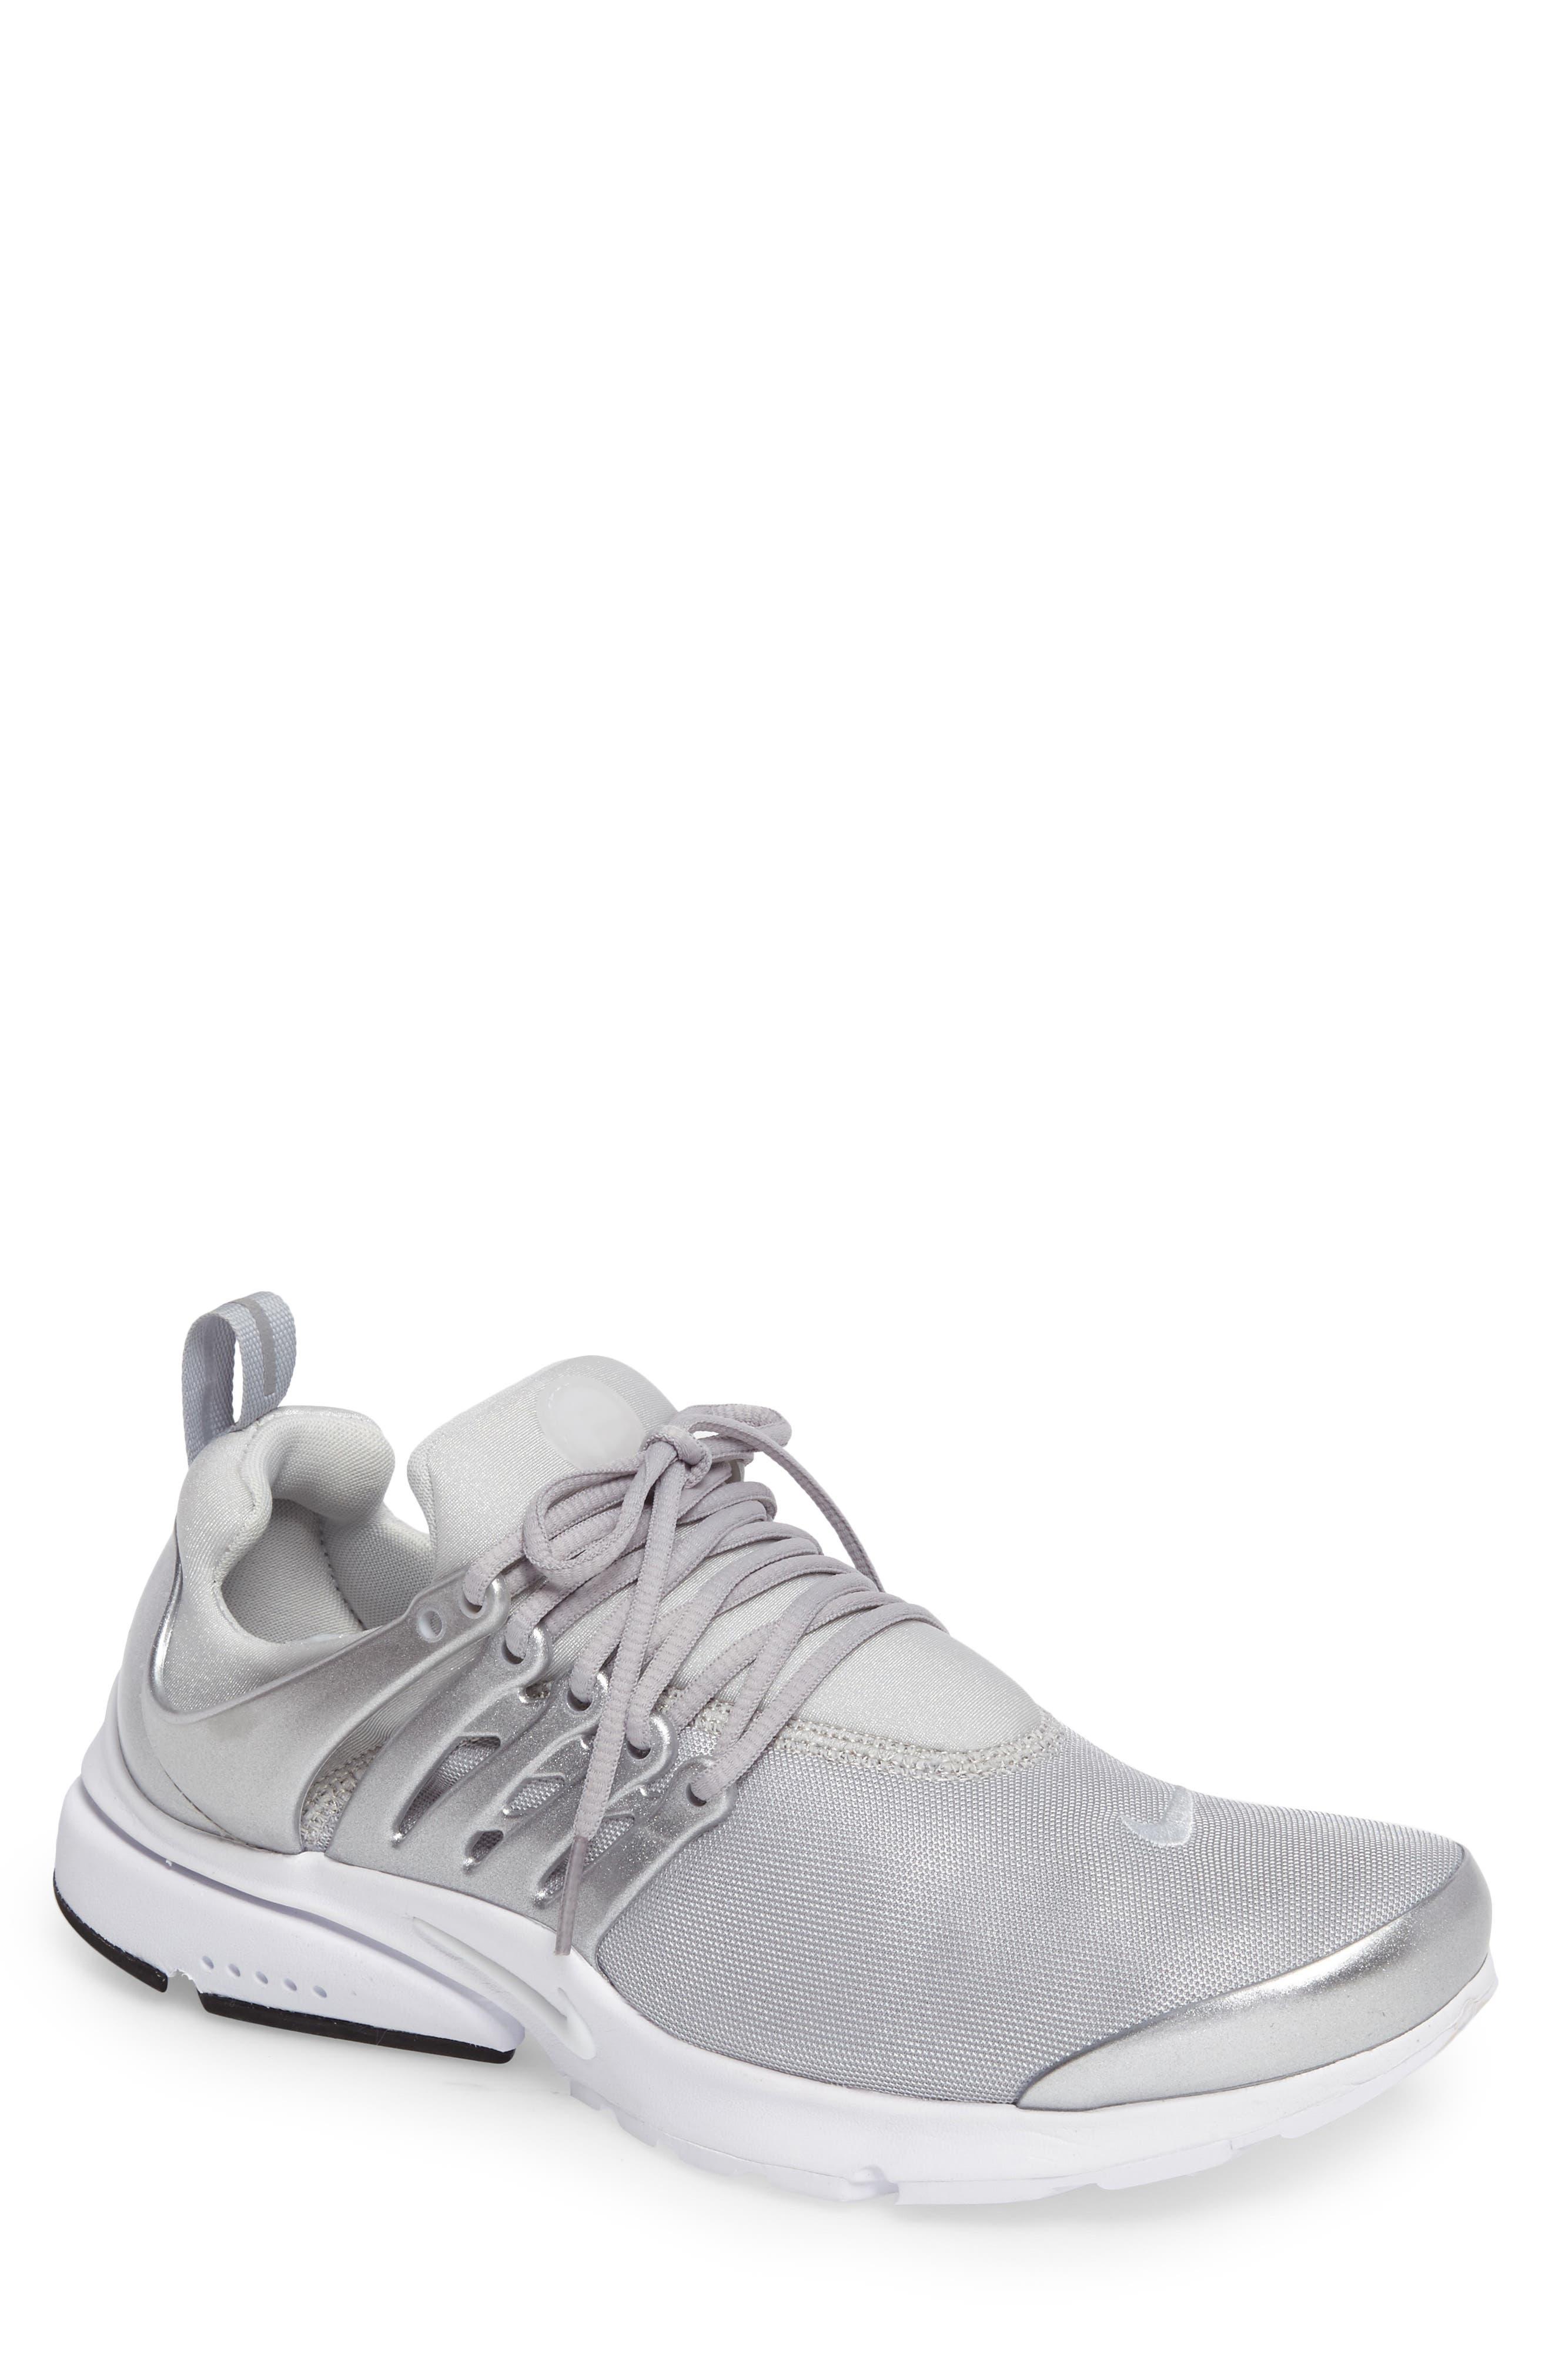 Air Presto Premium Sneaker,                         Main,                         color, 021